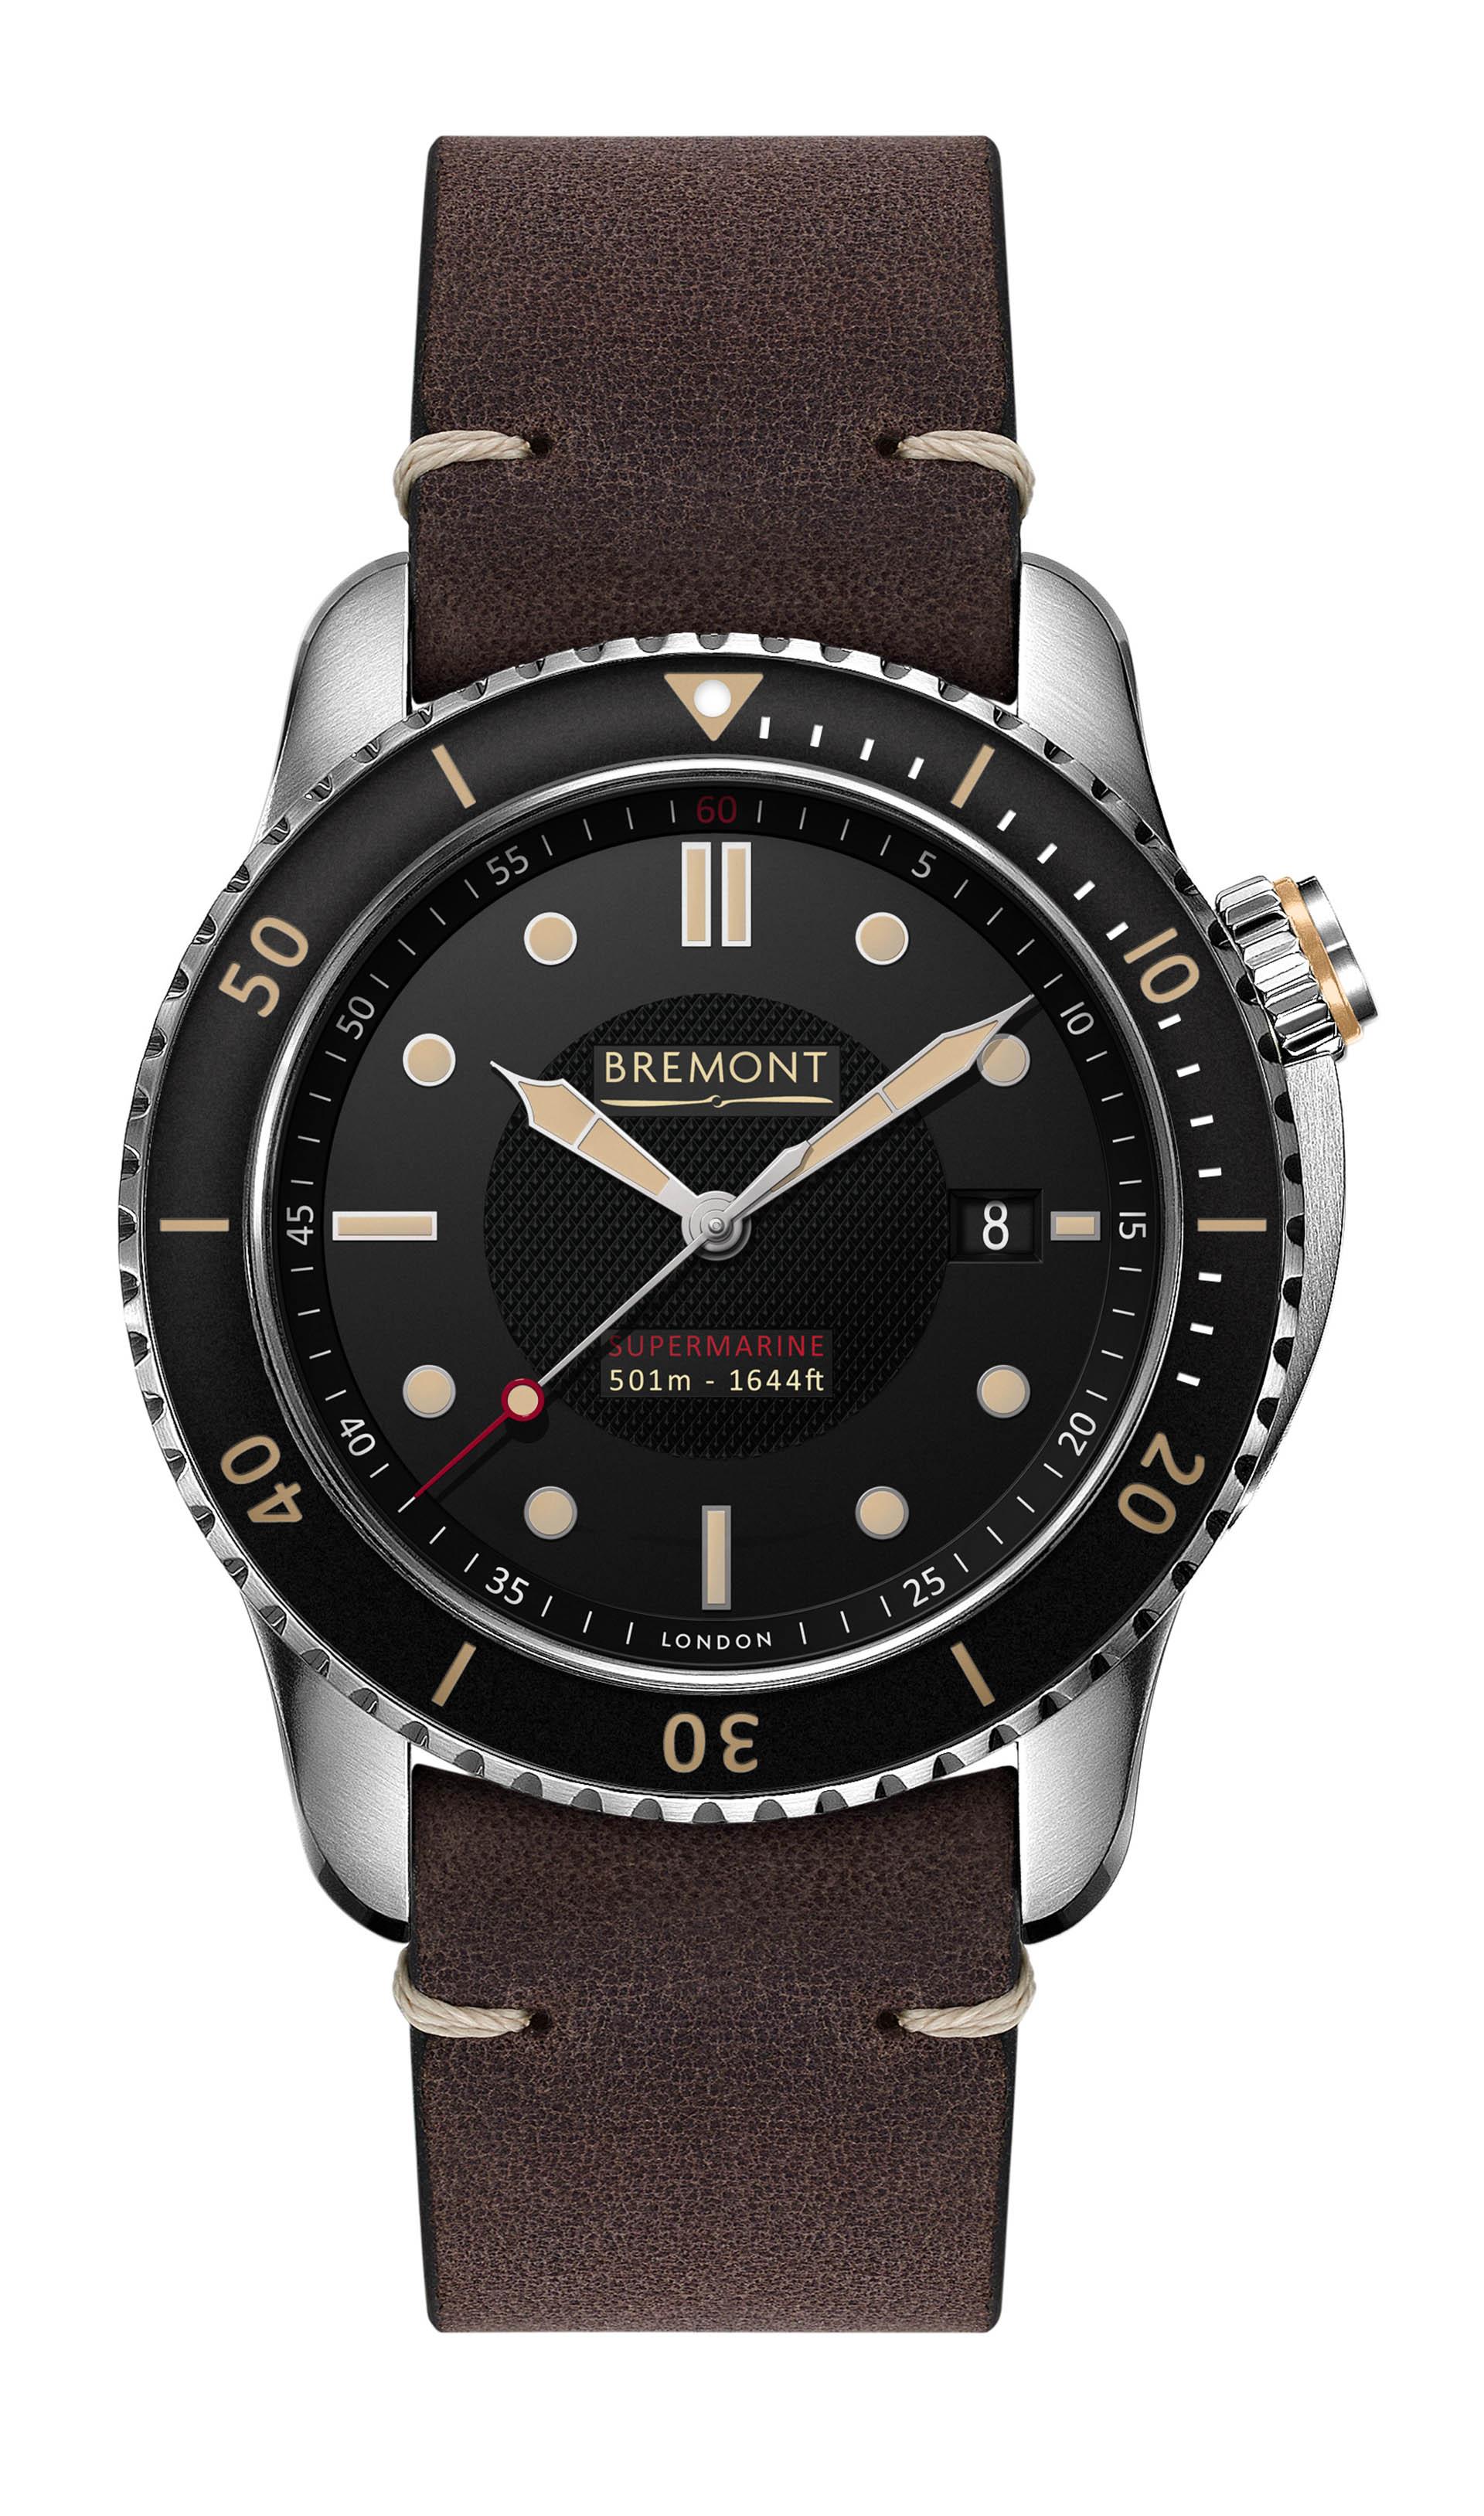 Bremont Supermarine S501, 3995 EUR